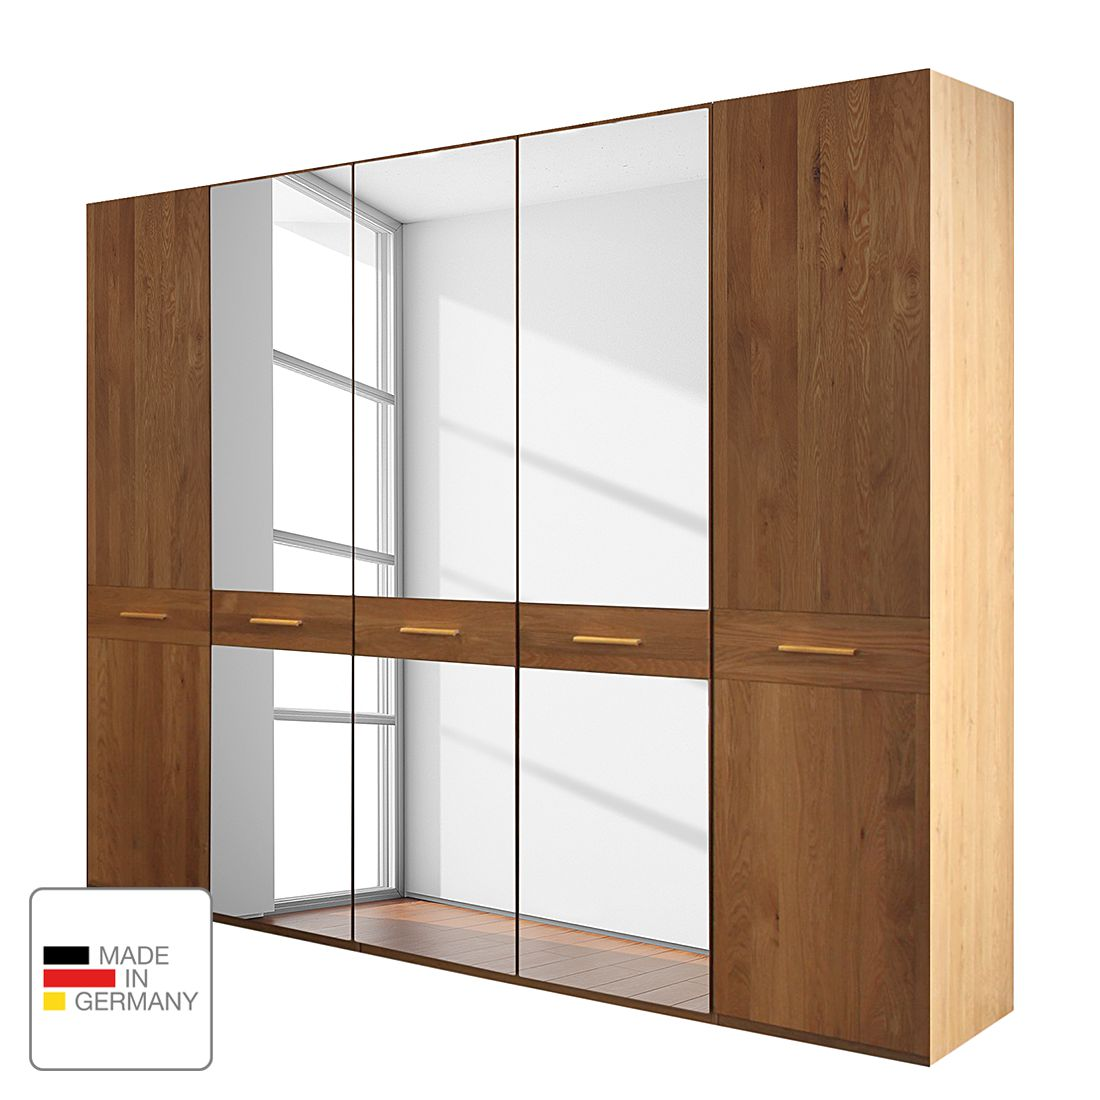 eiche 6 t rig preis vergleich 2016. Black Bedroom Furniture Sets. Home Design Ideas